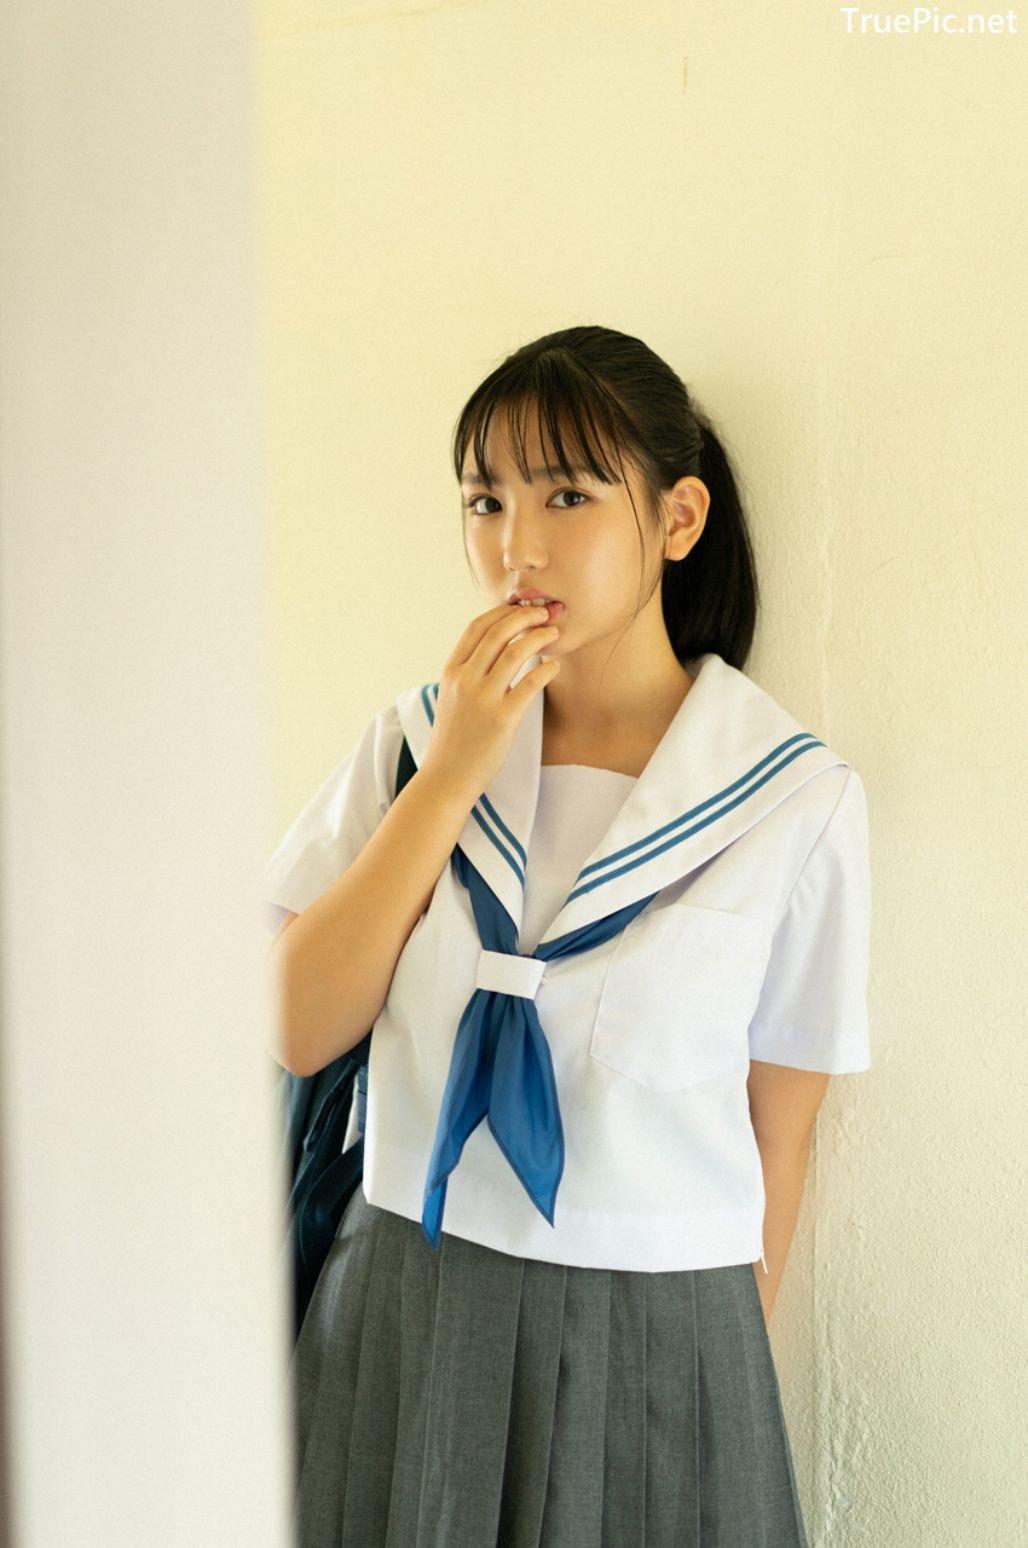 Image-Japanese-Pop-Idol-Aika-Sawaguchi-Champion-Road-TruePic.net- Picture-2